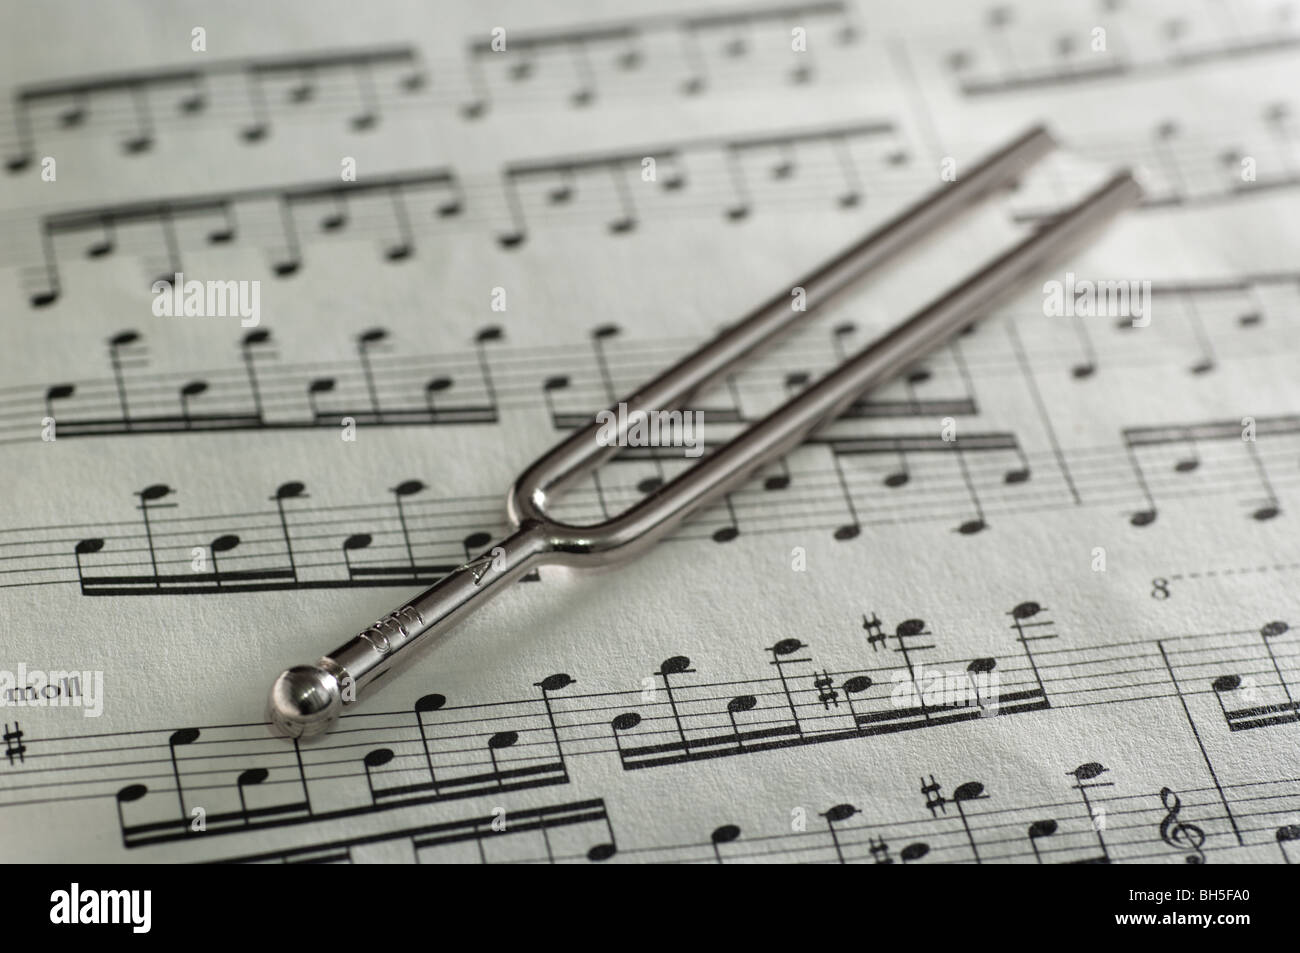 Diapasón en una hoja de música Foto & Imagen De Stock: 27781320 - Alamy